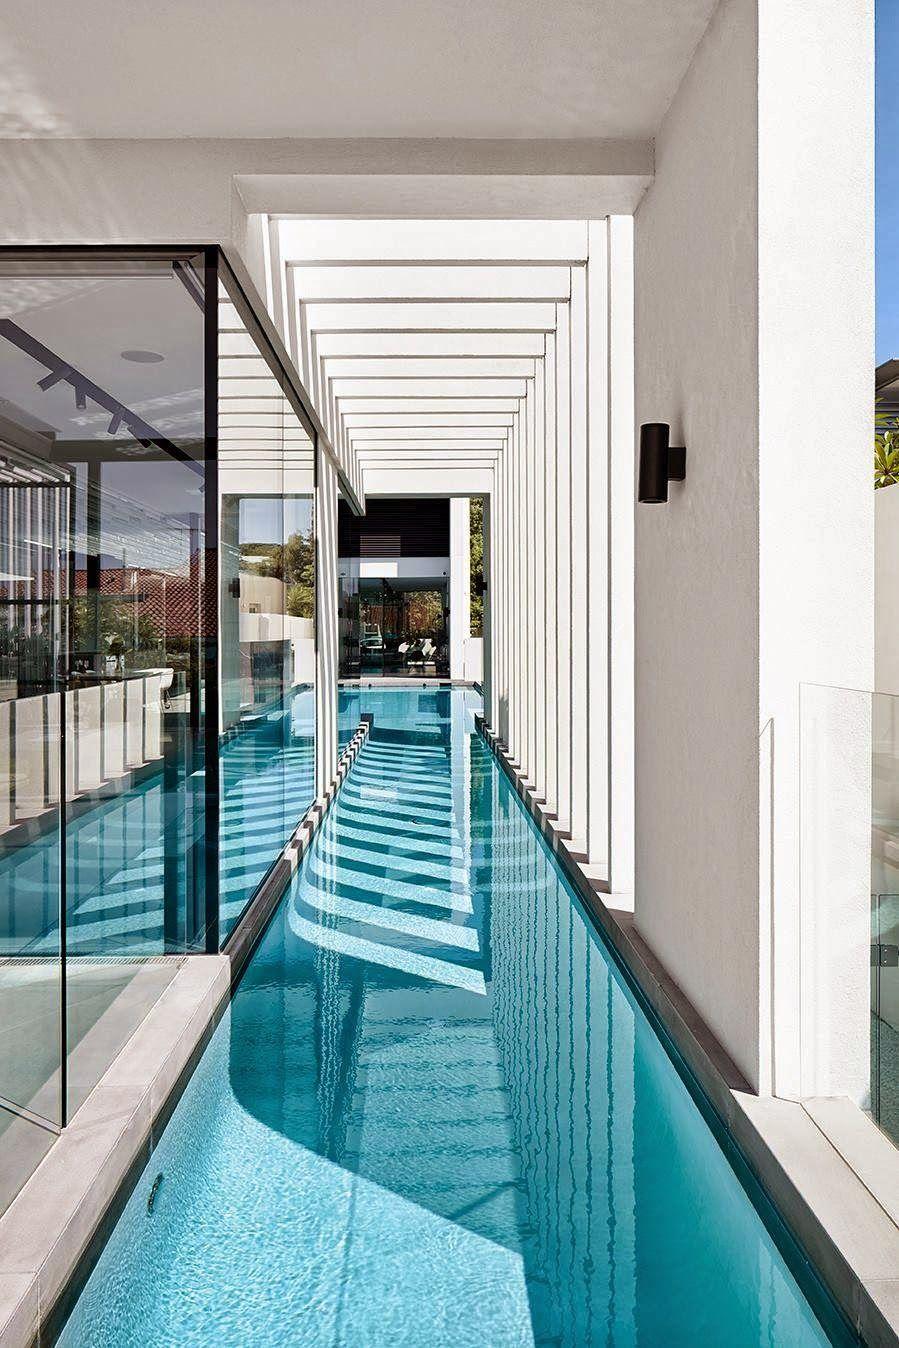 piscine amazing gold piscine maison et maison moderne. Black Bedroom Furniture Sets. Home Design Ideas